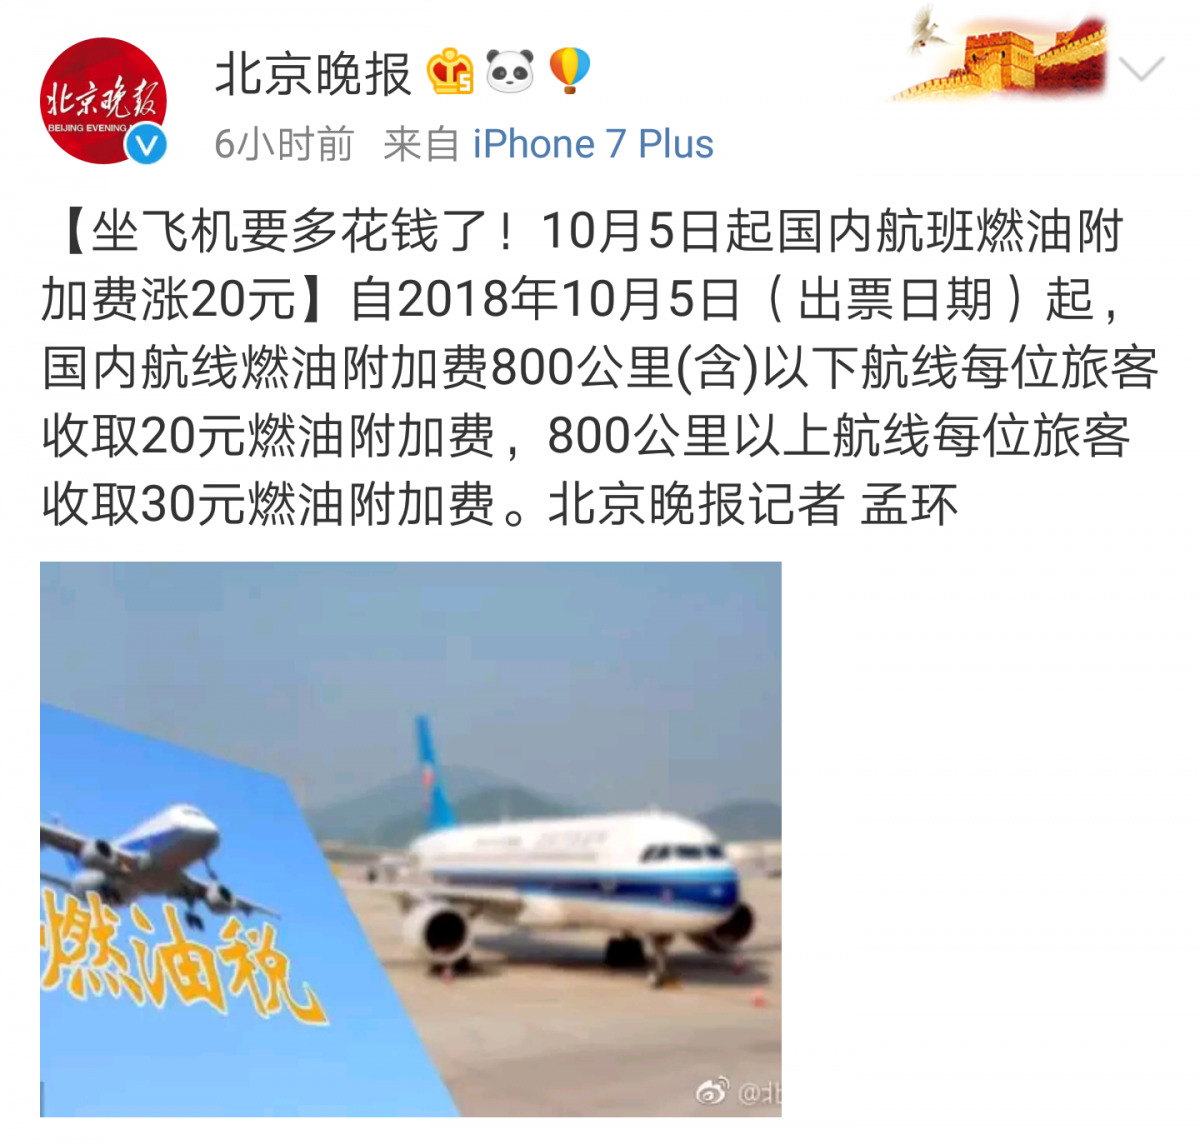 北京晚报.png